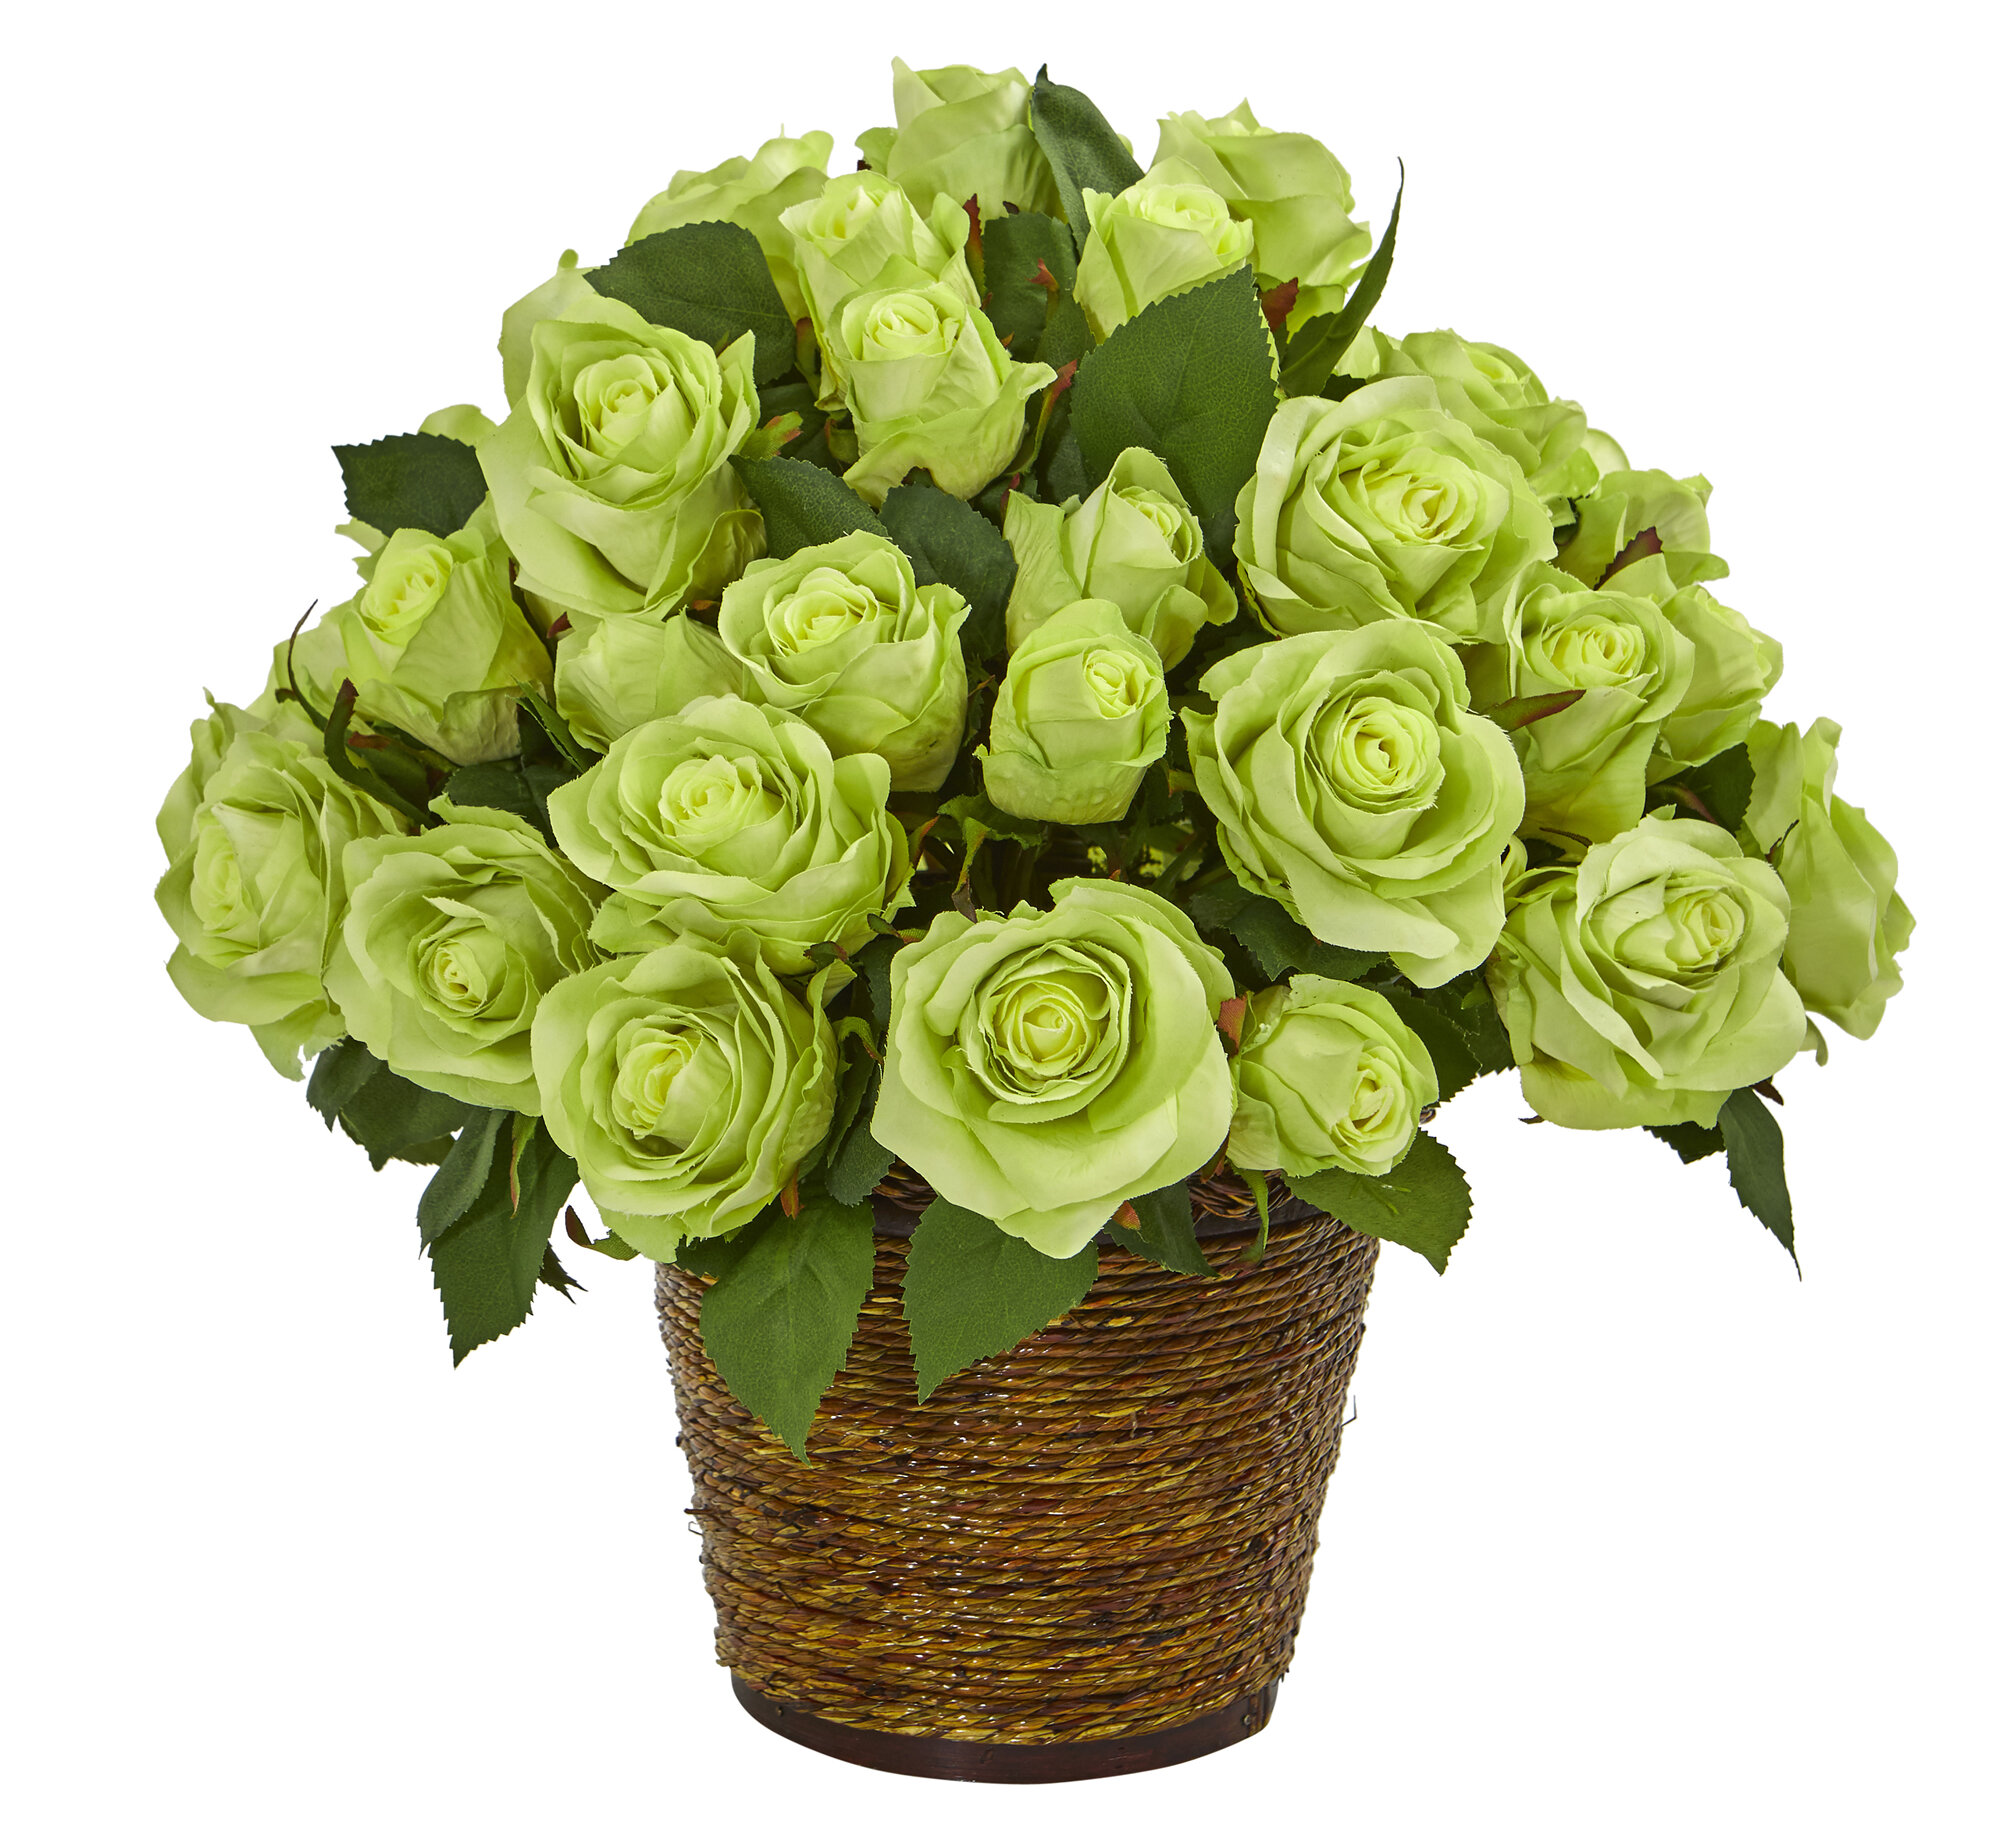 Ebern Designs Artificial Roses Floral Arrangements In Basket Wayfair